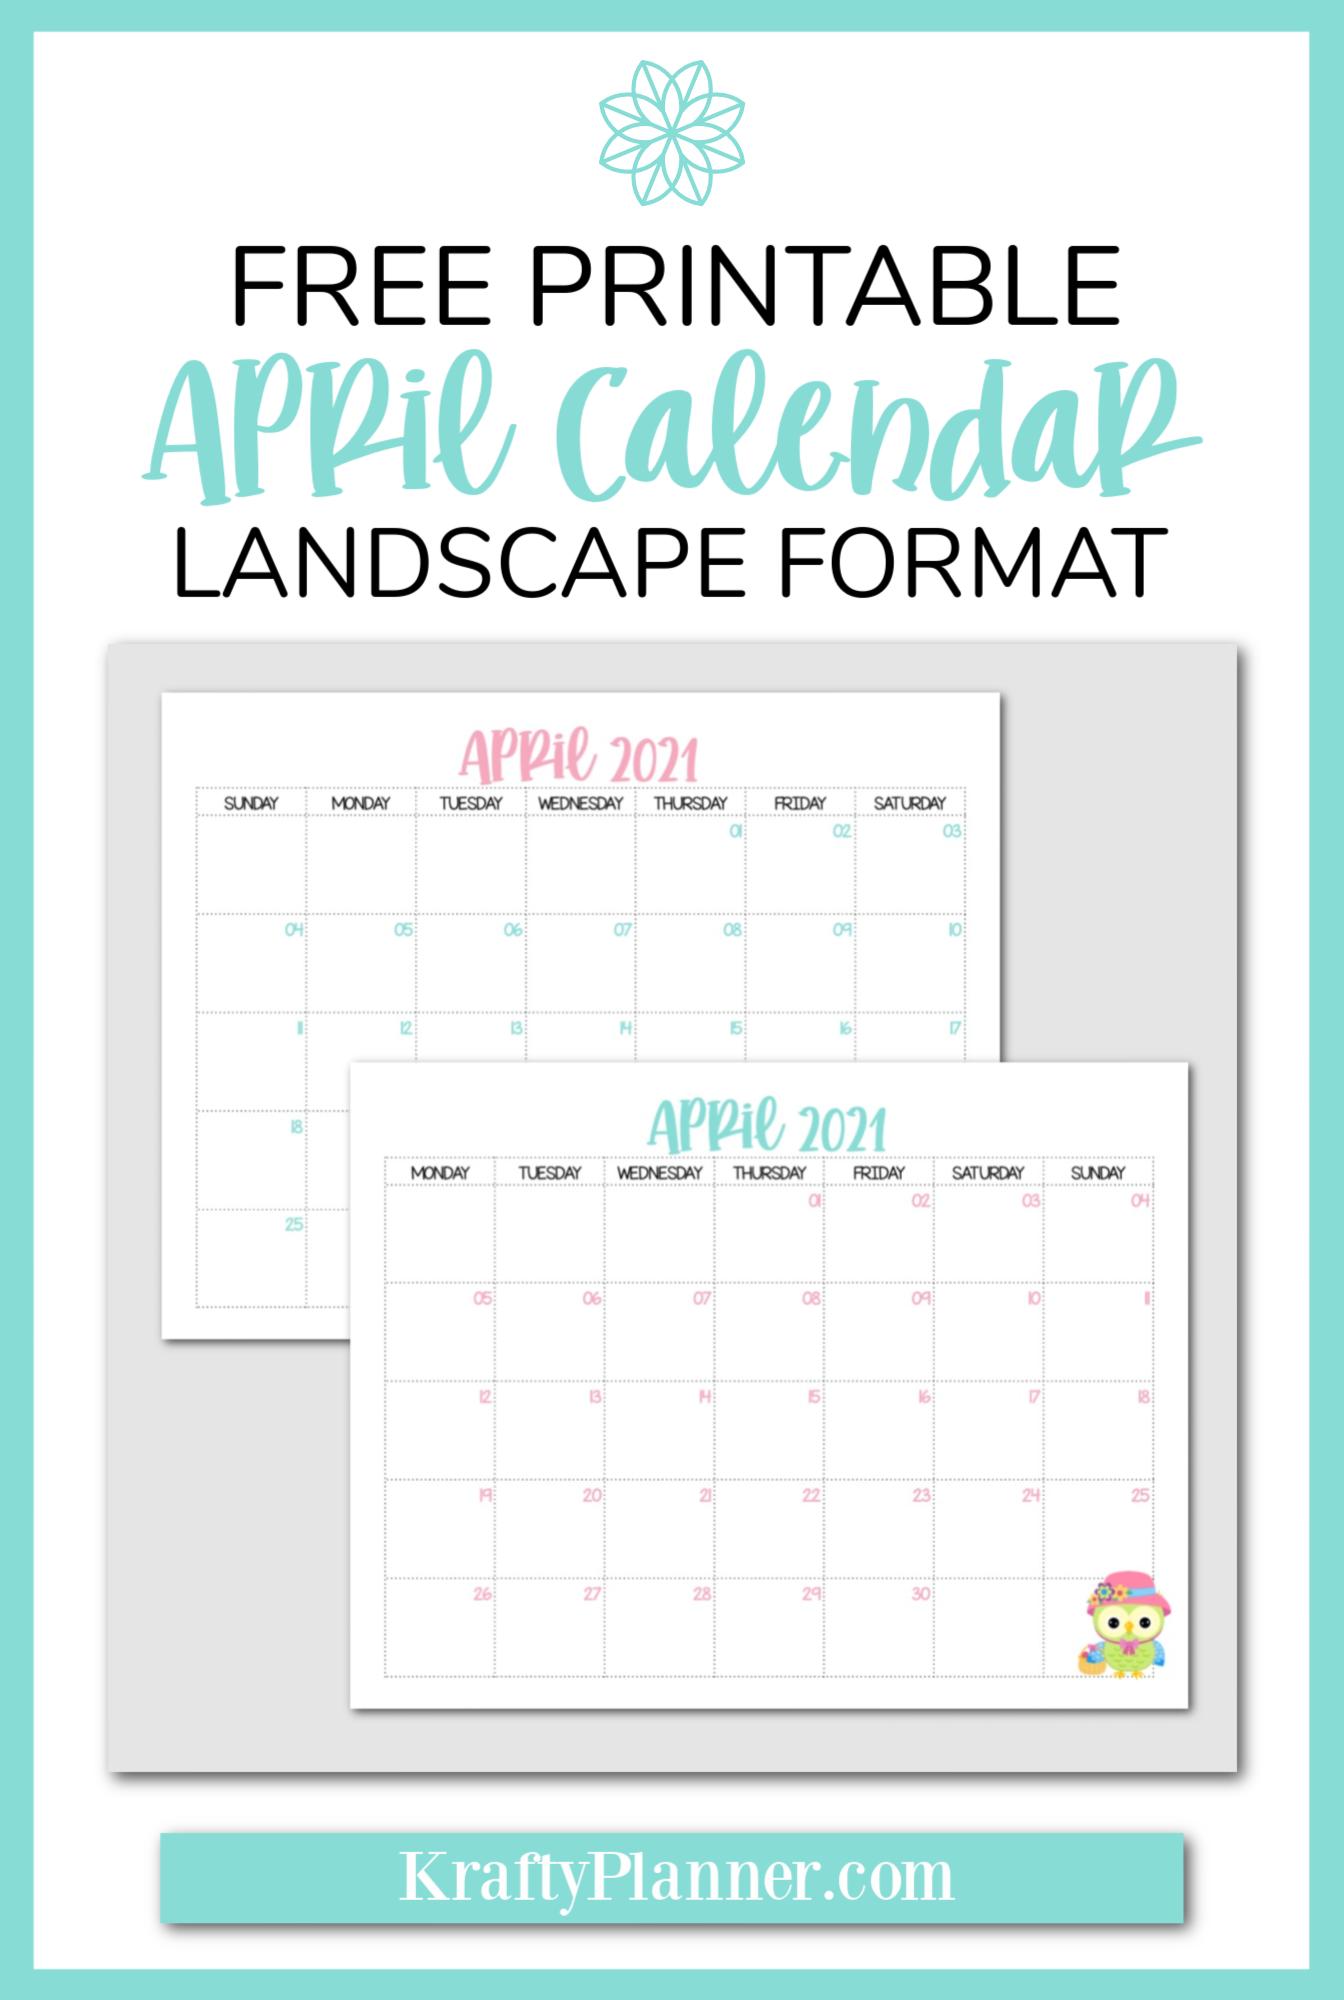 Free Printable April 2021 Calendar {Landscape Format} PIN 2.png